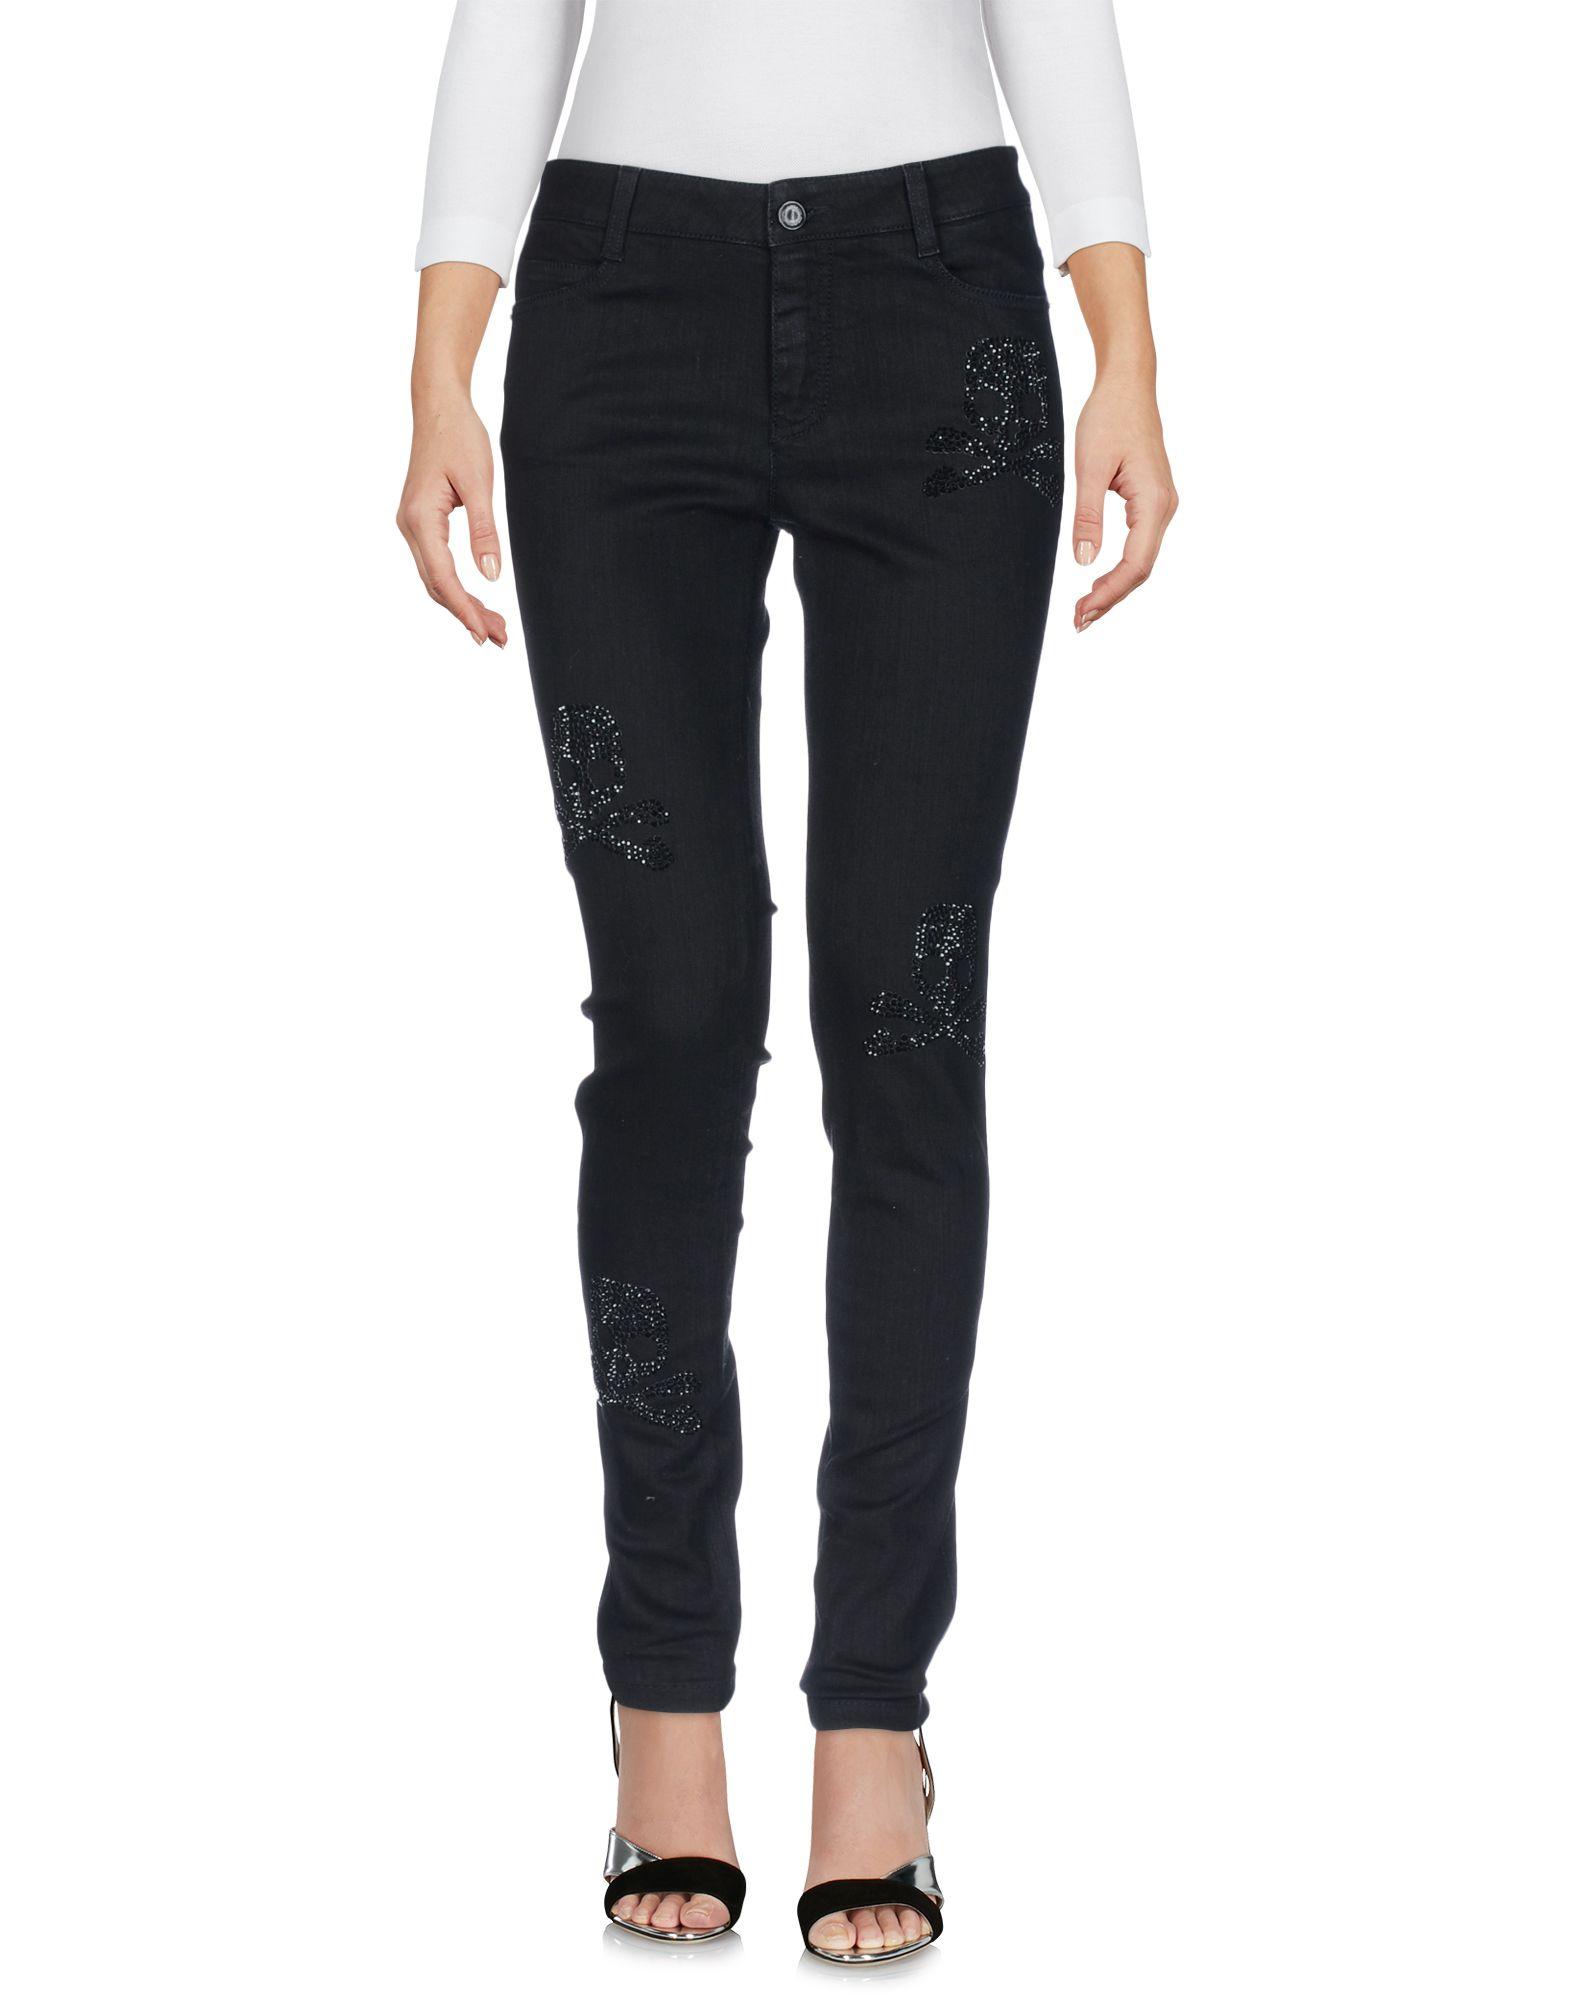 Pantaloni Jeans Ermanno Scervino Donna - Acquista online su Yyd5s8